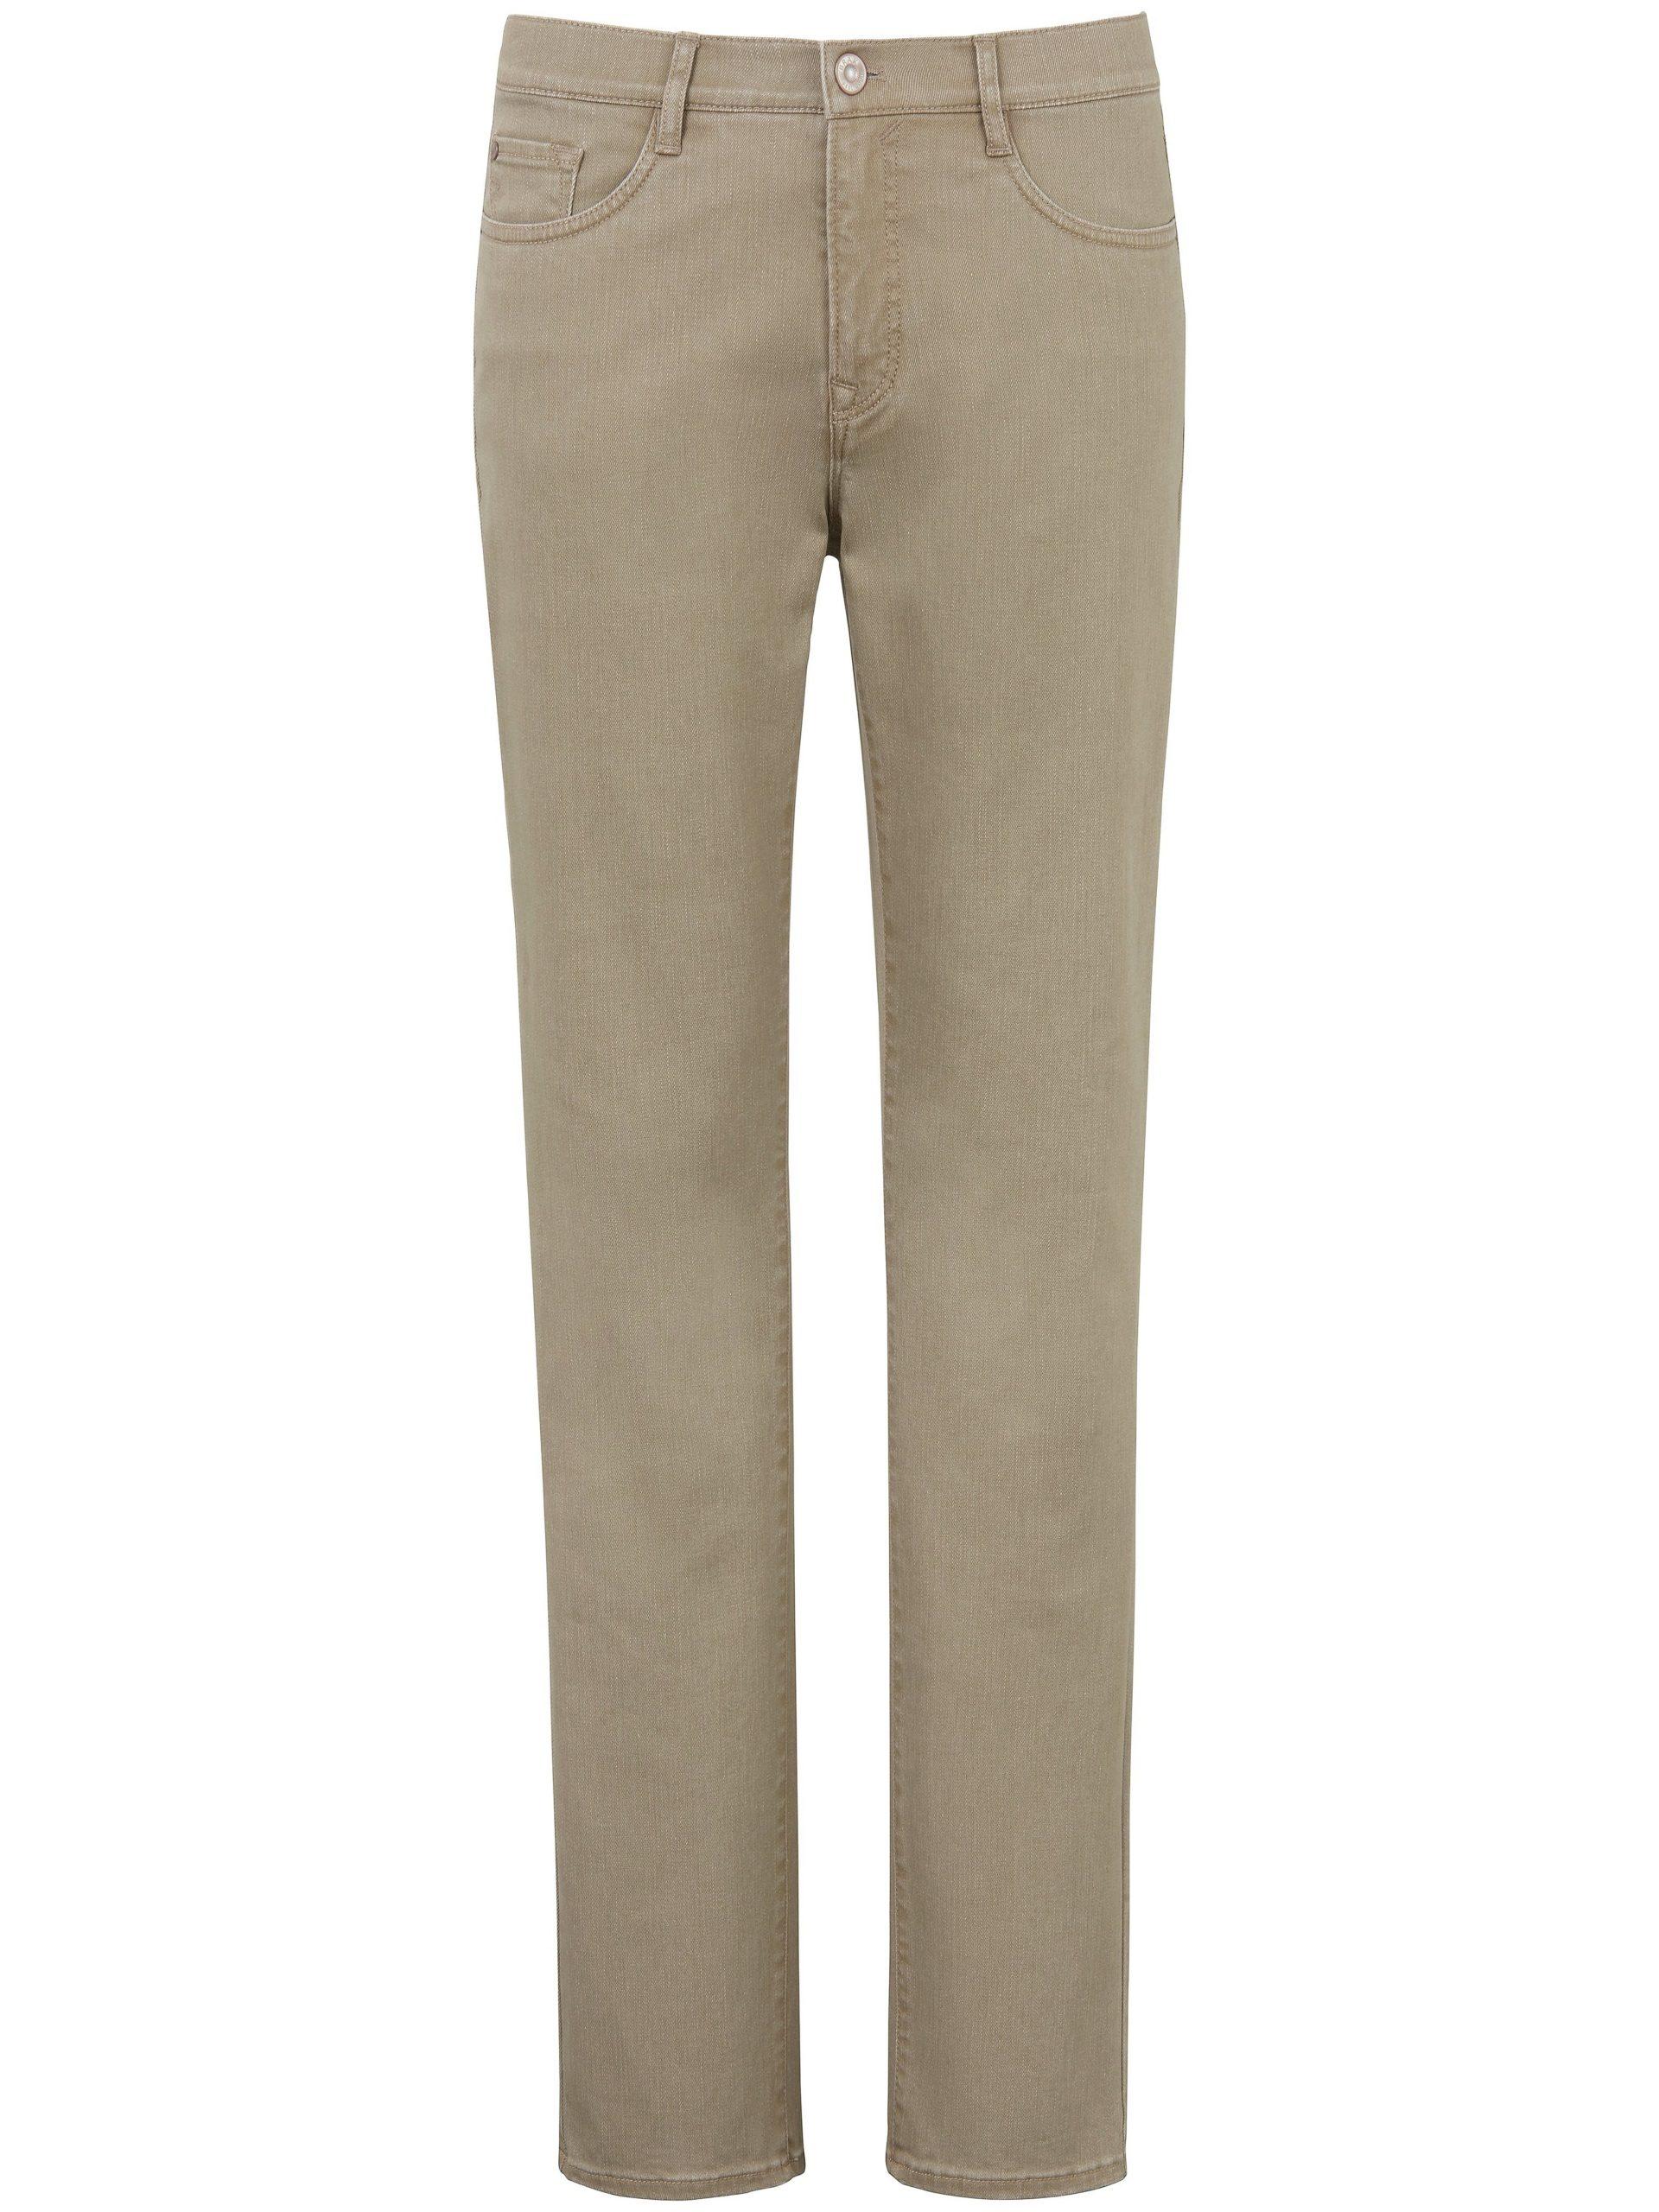 Slim fit jeans model Mary Van Brax Feel Good denim Kopen